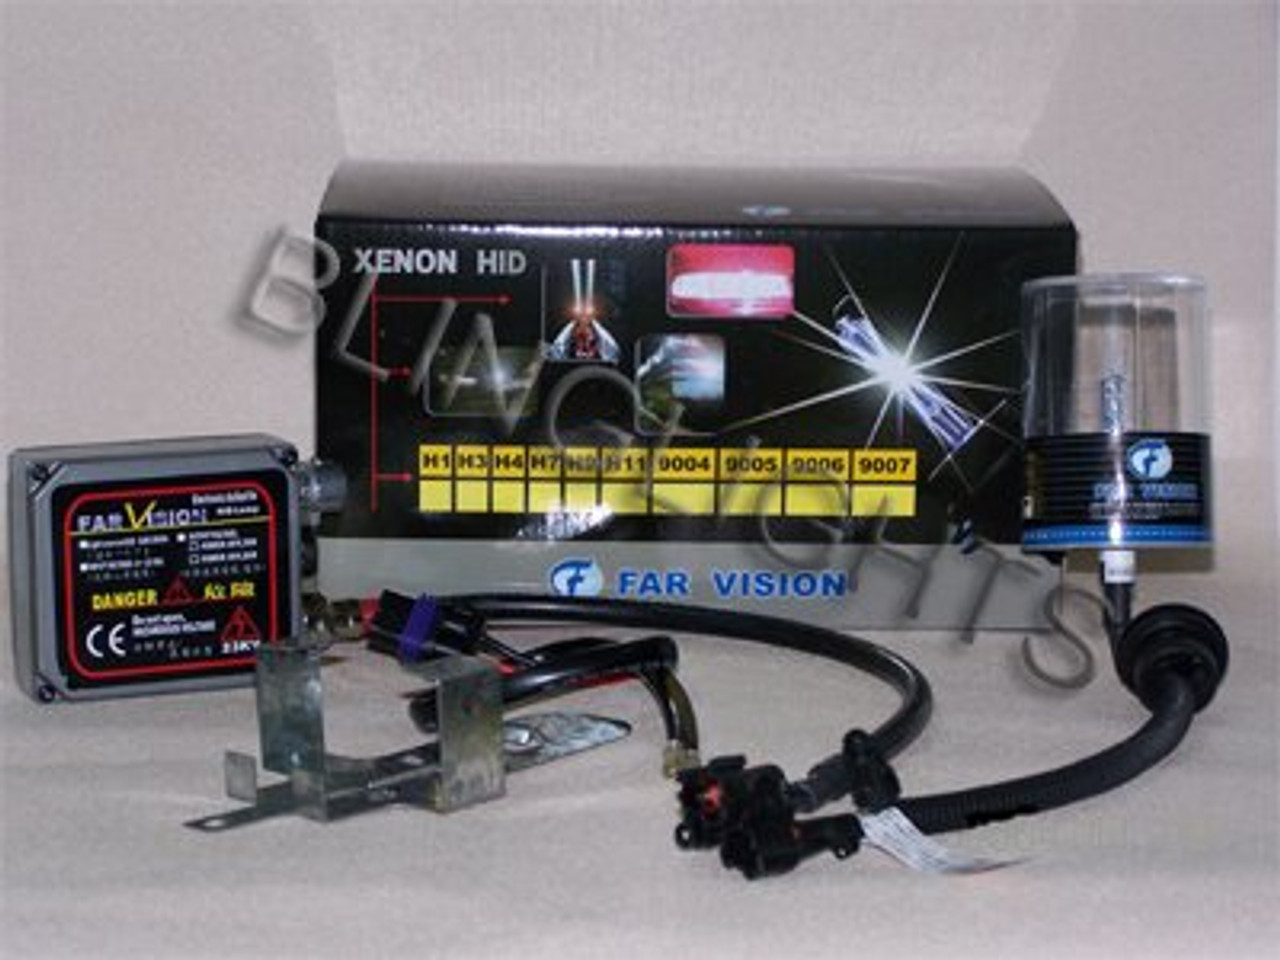 2004 2005 2006 2007 2008 Nissan Maxima 55 Watt Xenon Hid Headlamps Headlights Conversion Kit